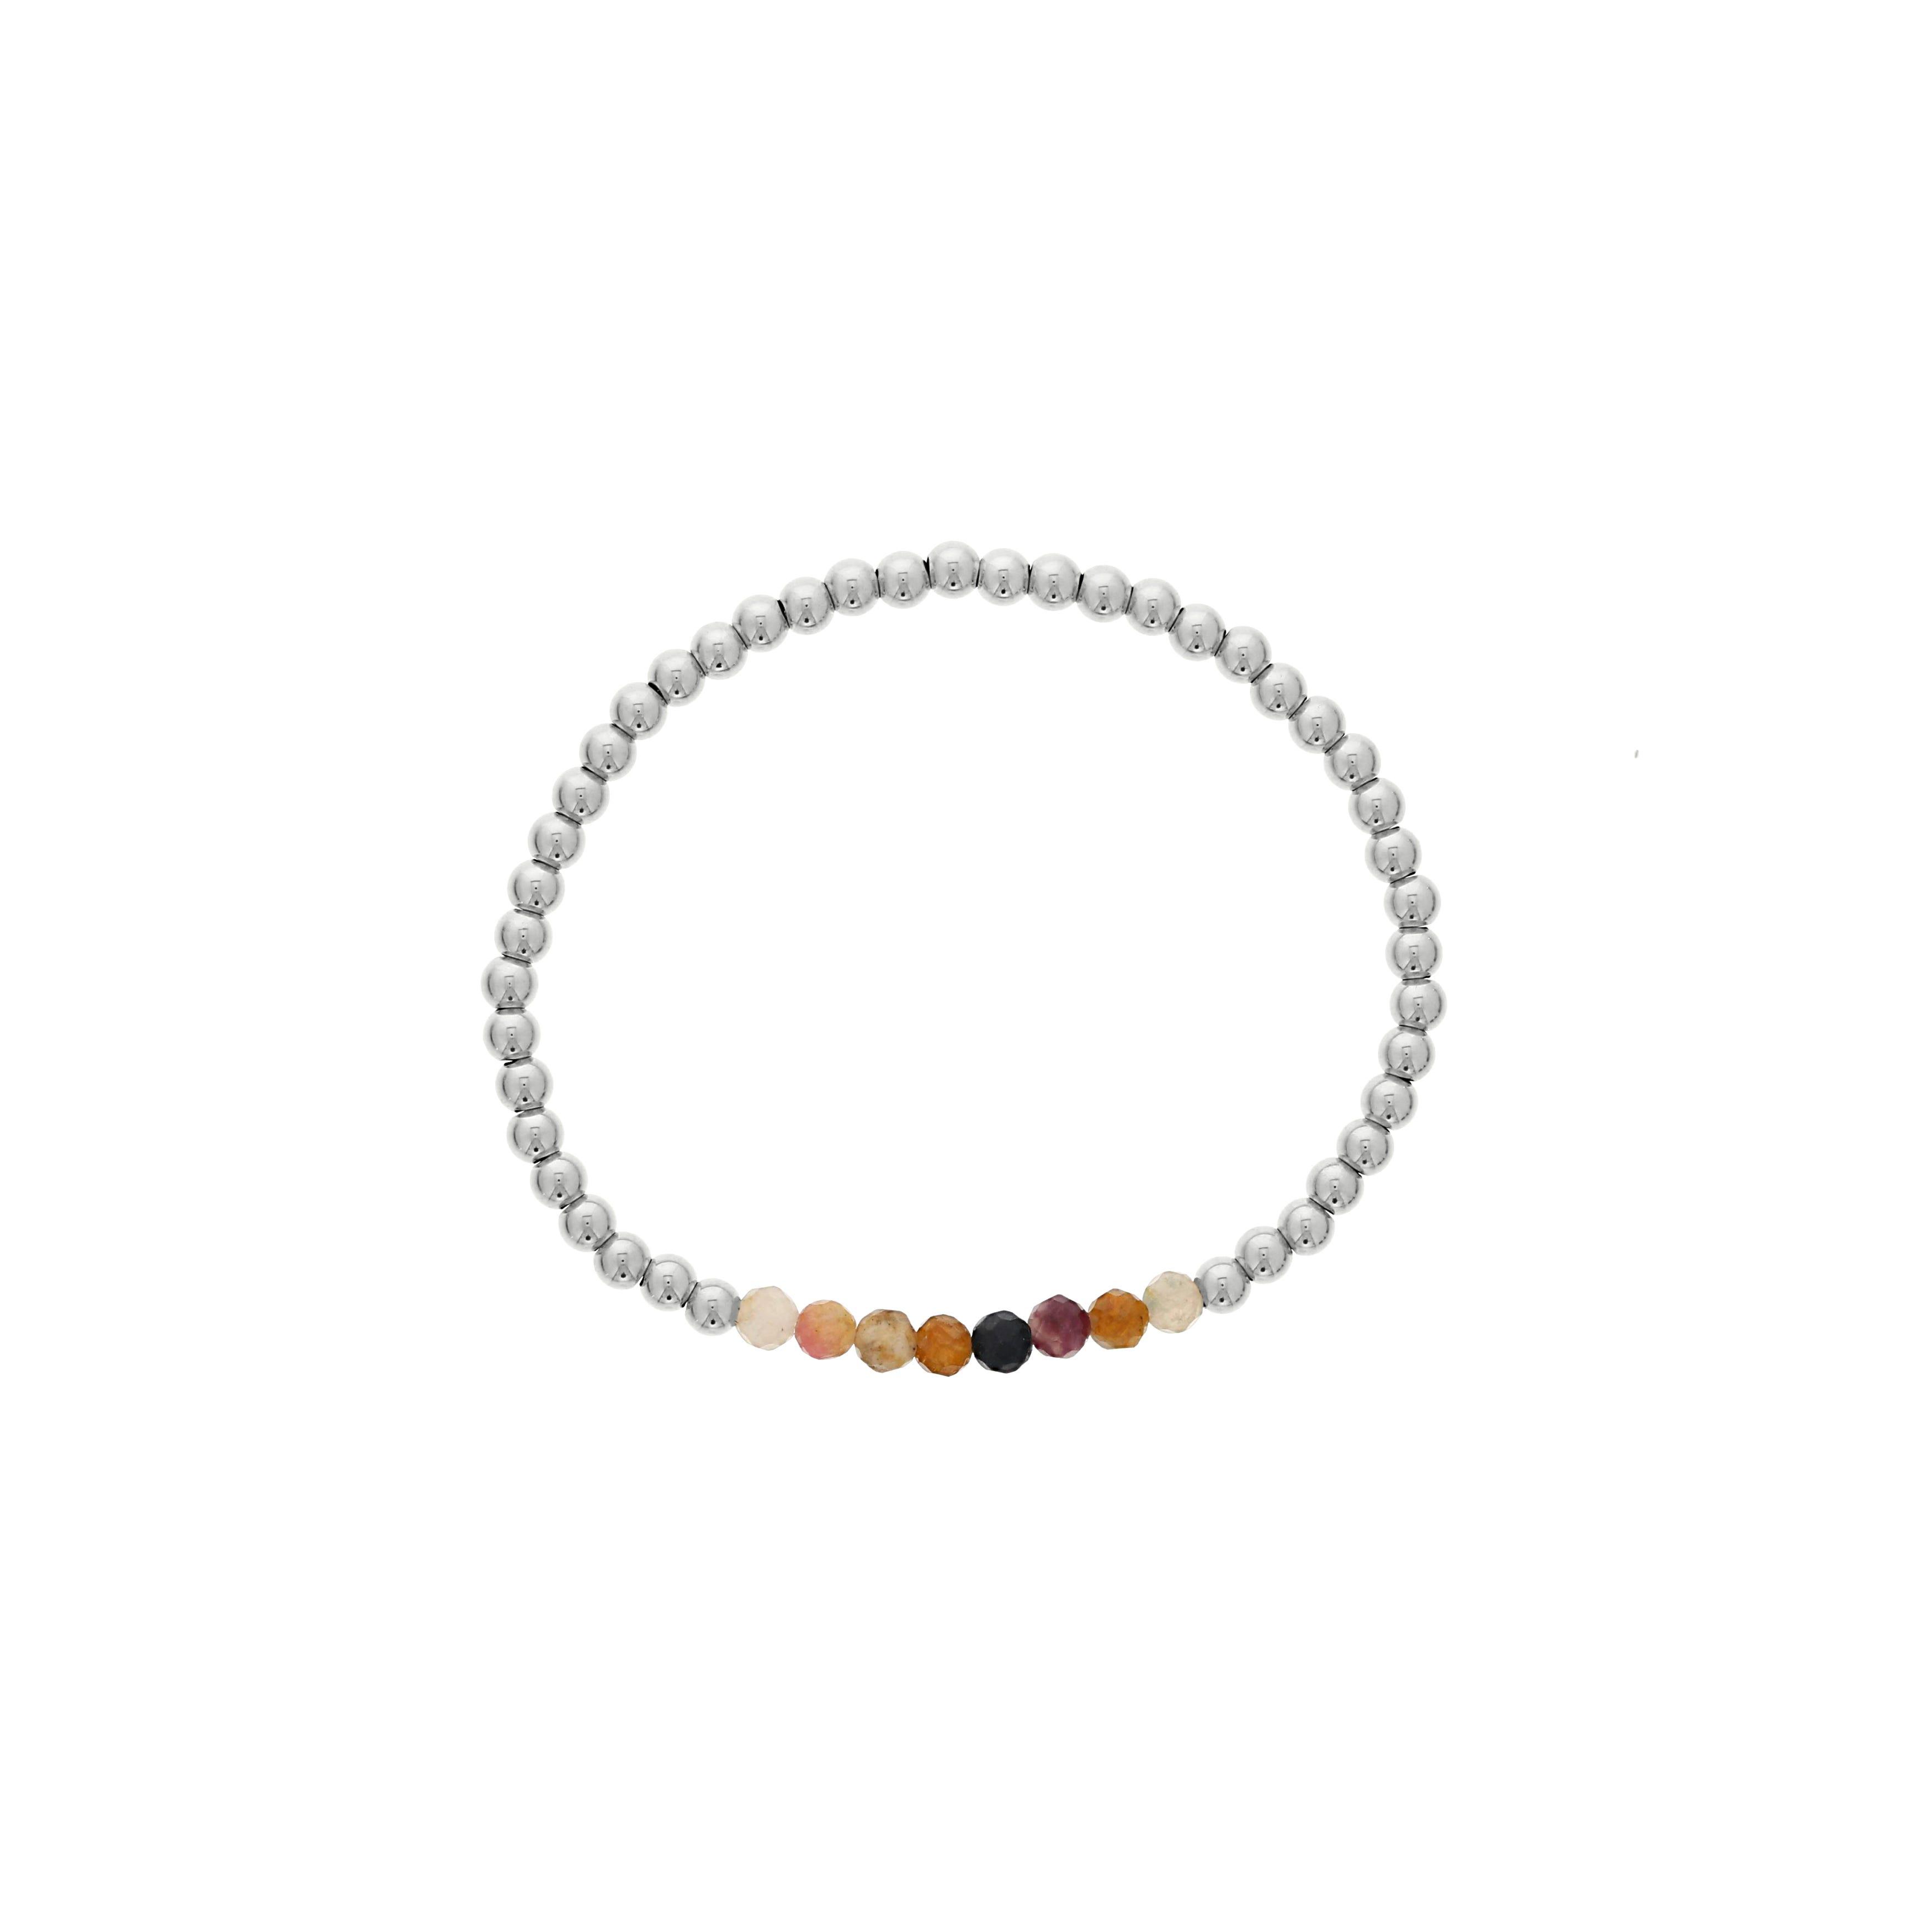 Multi-Color Tourmaline Birthstone Beaded Bracelet in Sterling Silver